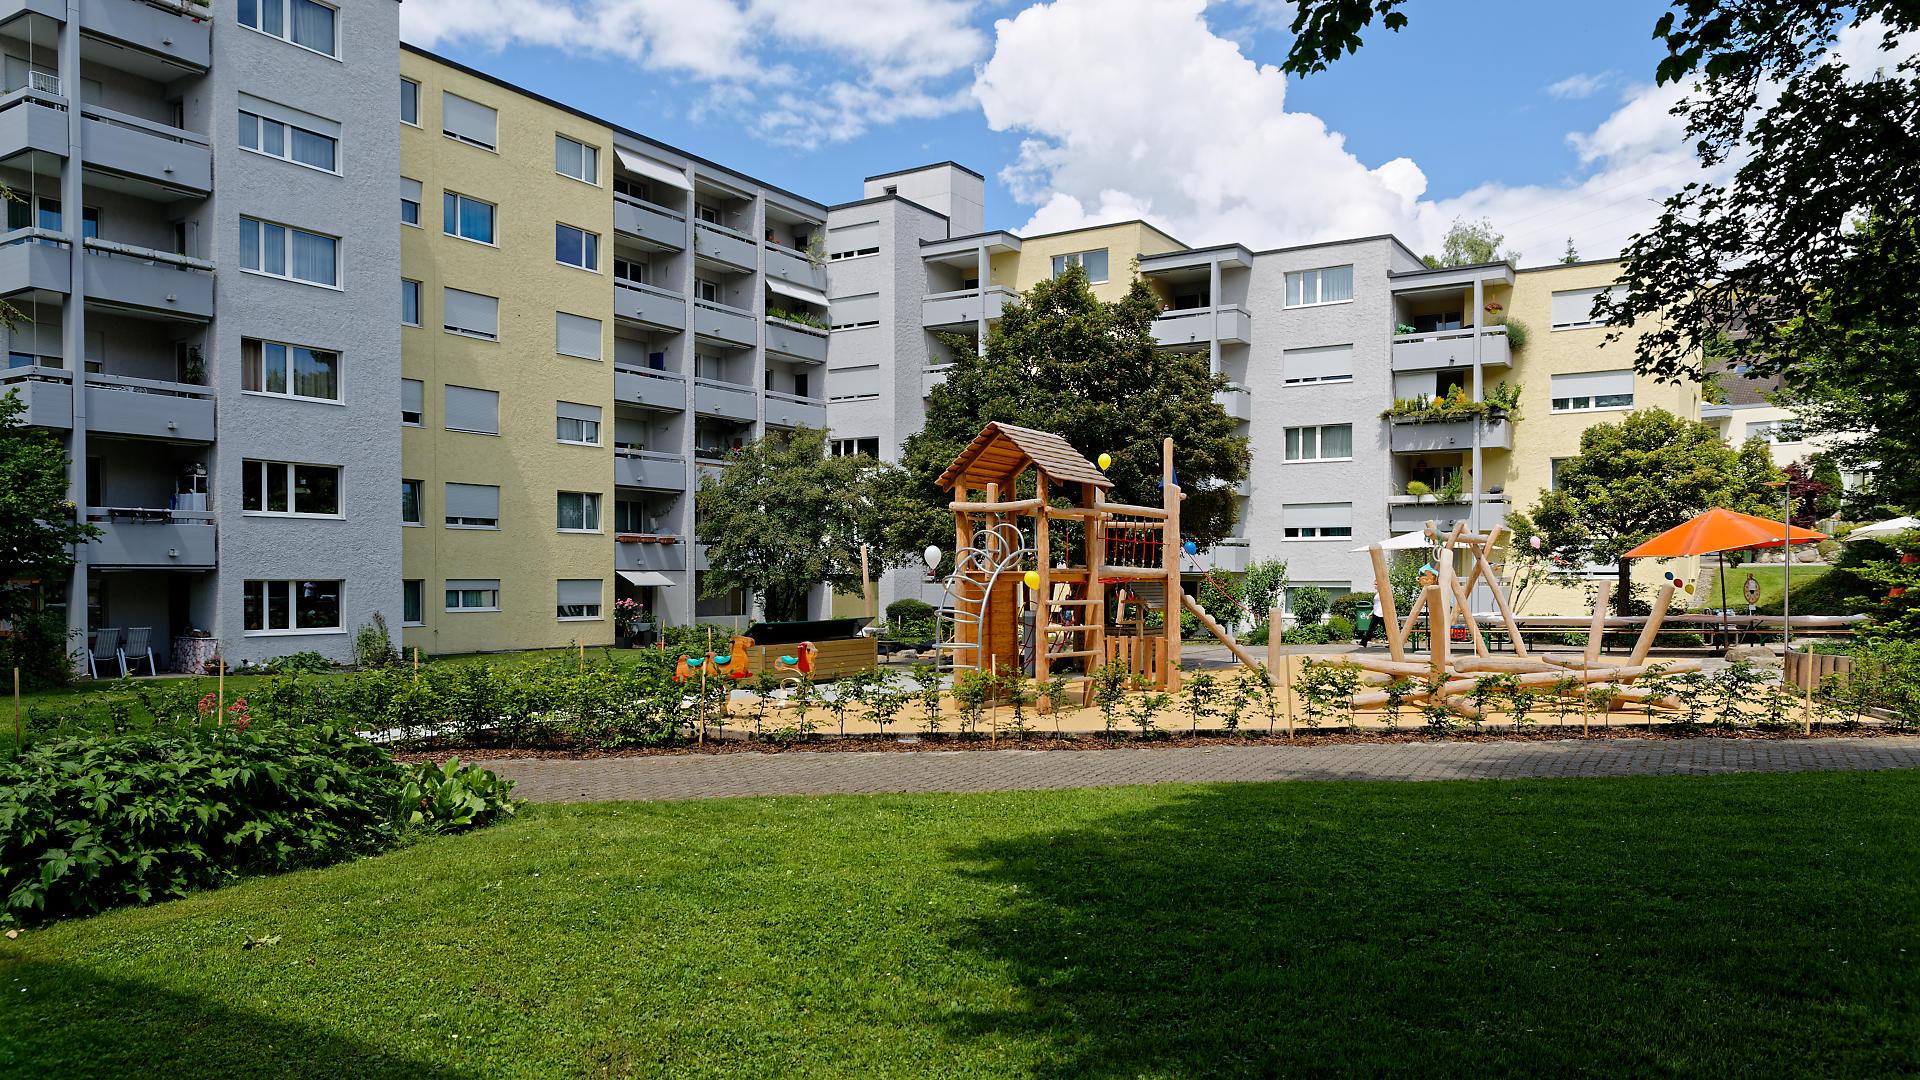 Wohn-Baugenossenschaft Hof